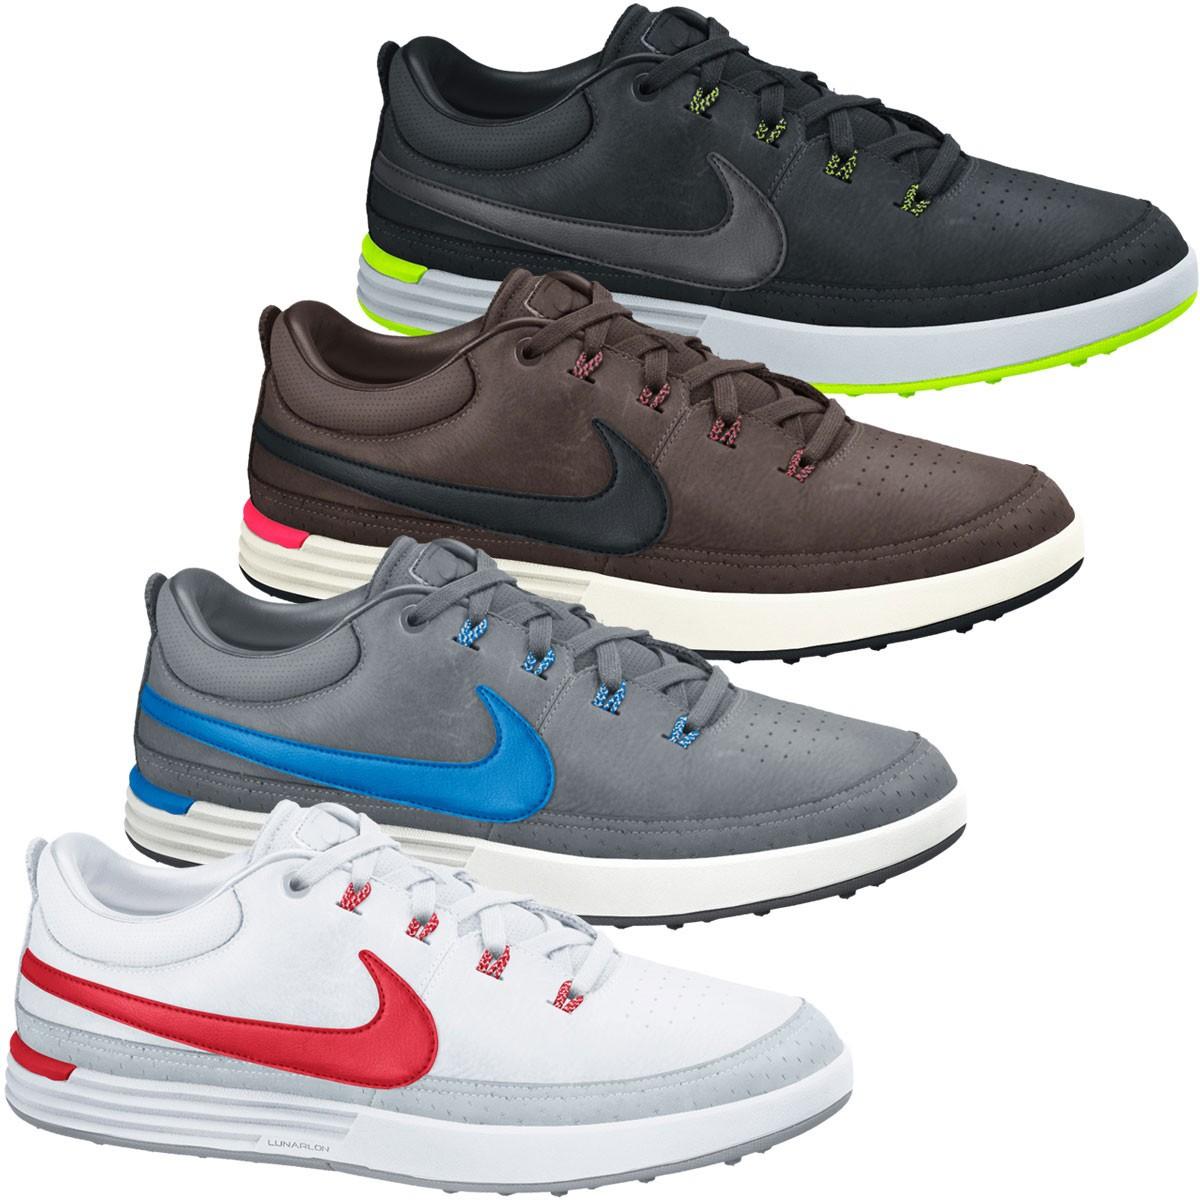 big sale 35521 982c9 Nike Golf Mens Lunar Waverly Spikeless Waterproof Golf Shoes